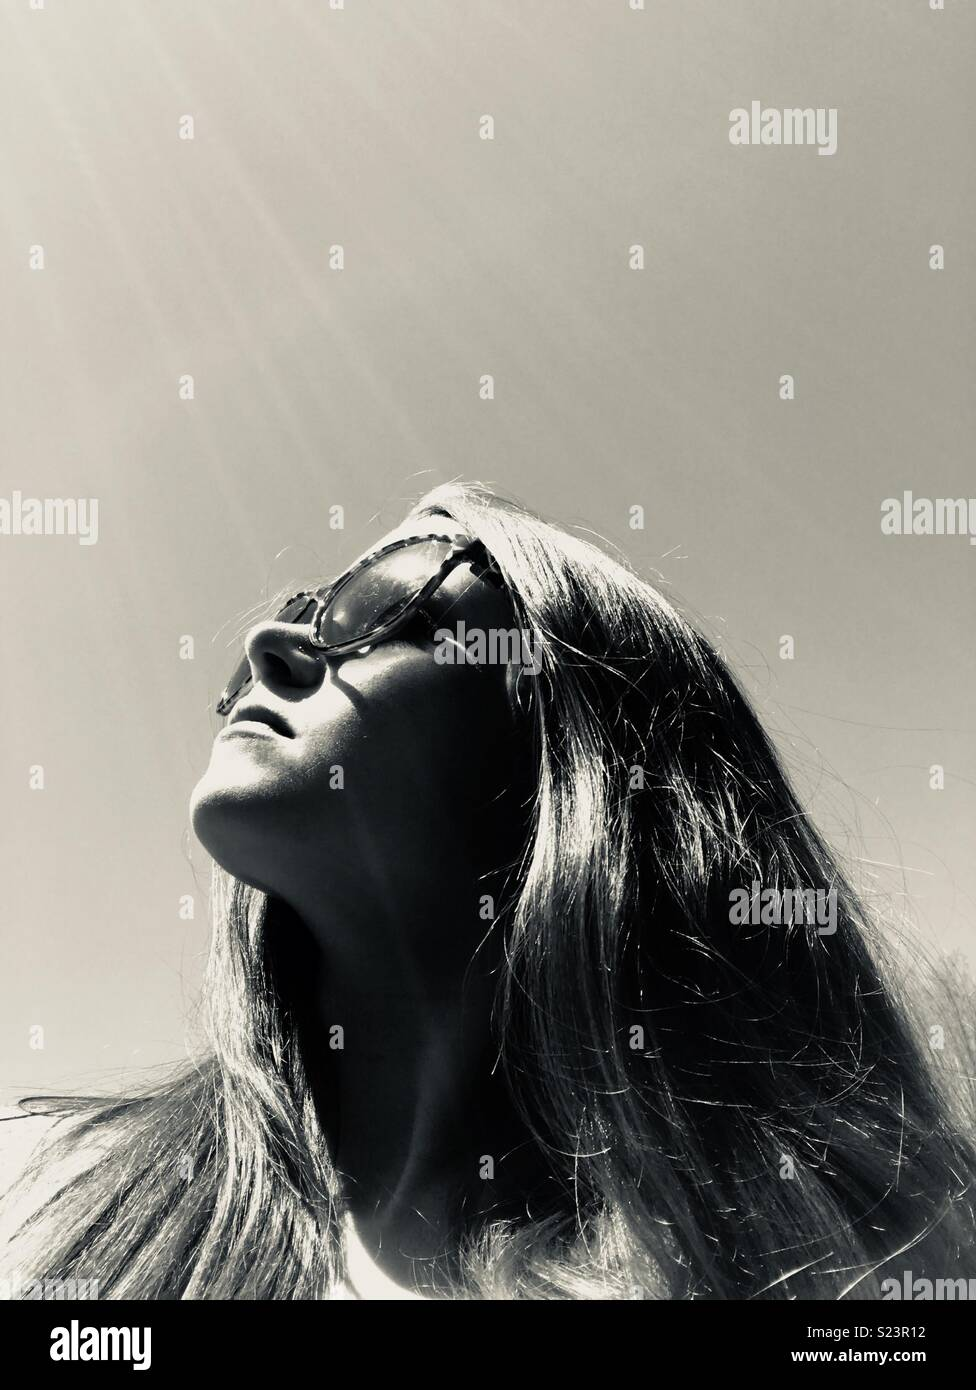 Sol brilhando na menina com óculos de sol Imagens de Stock